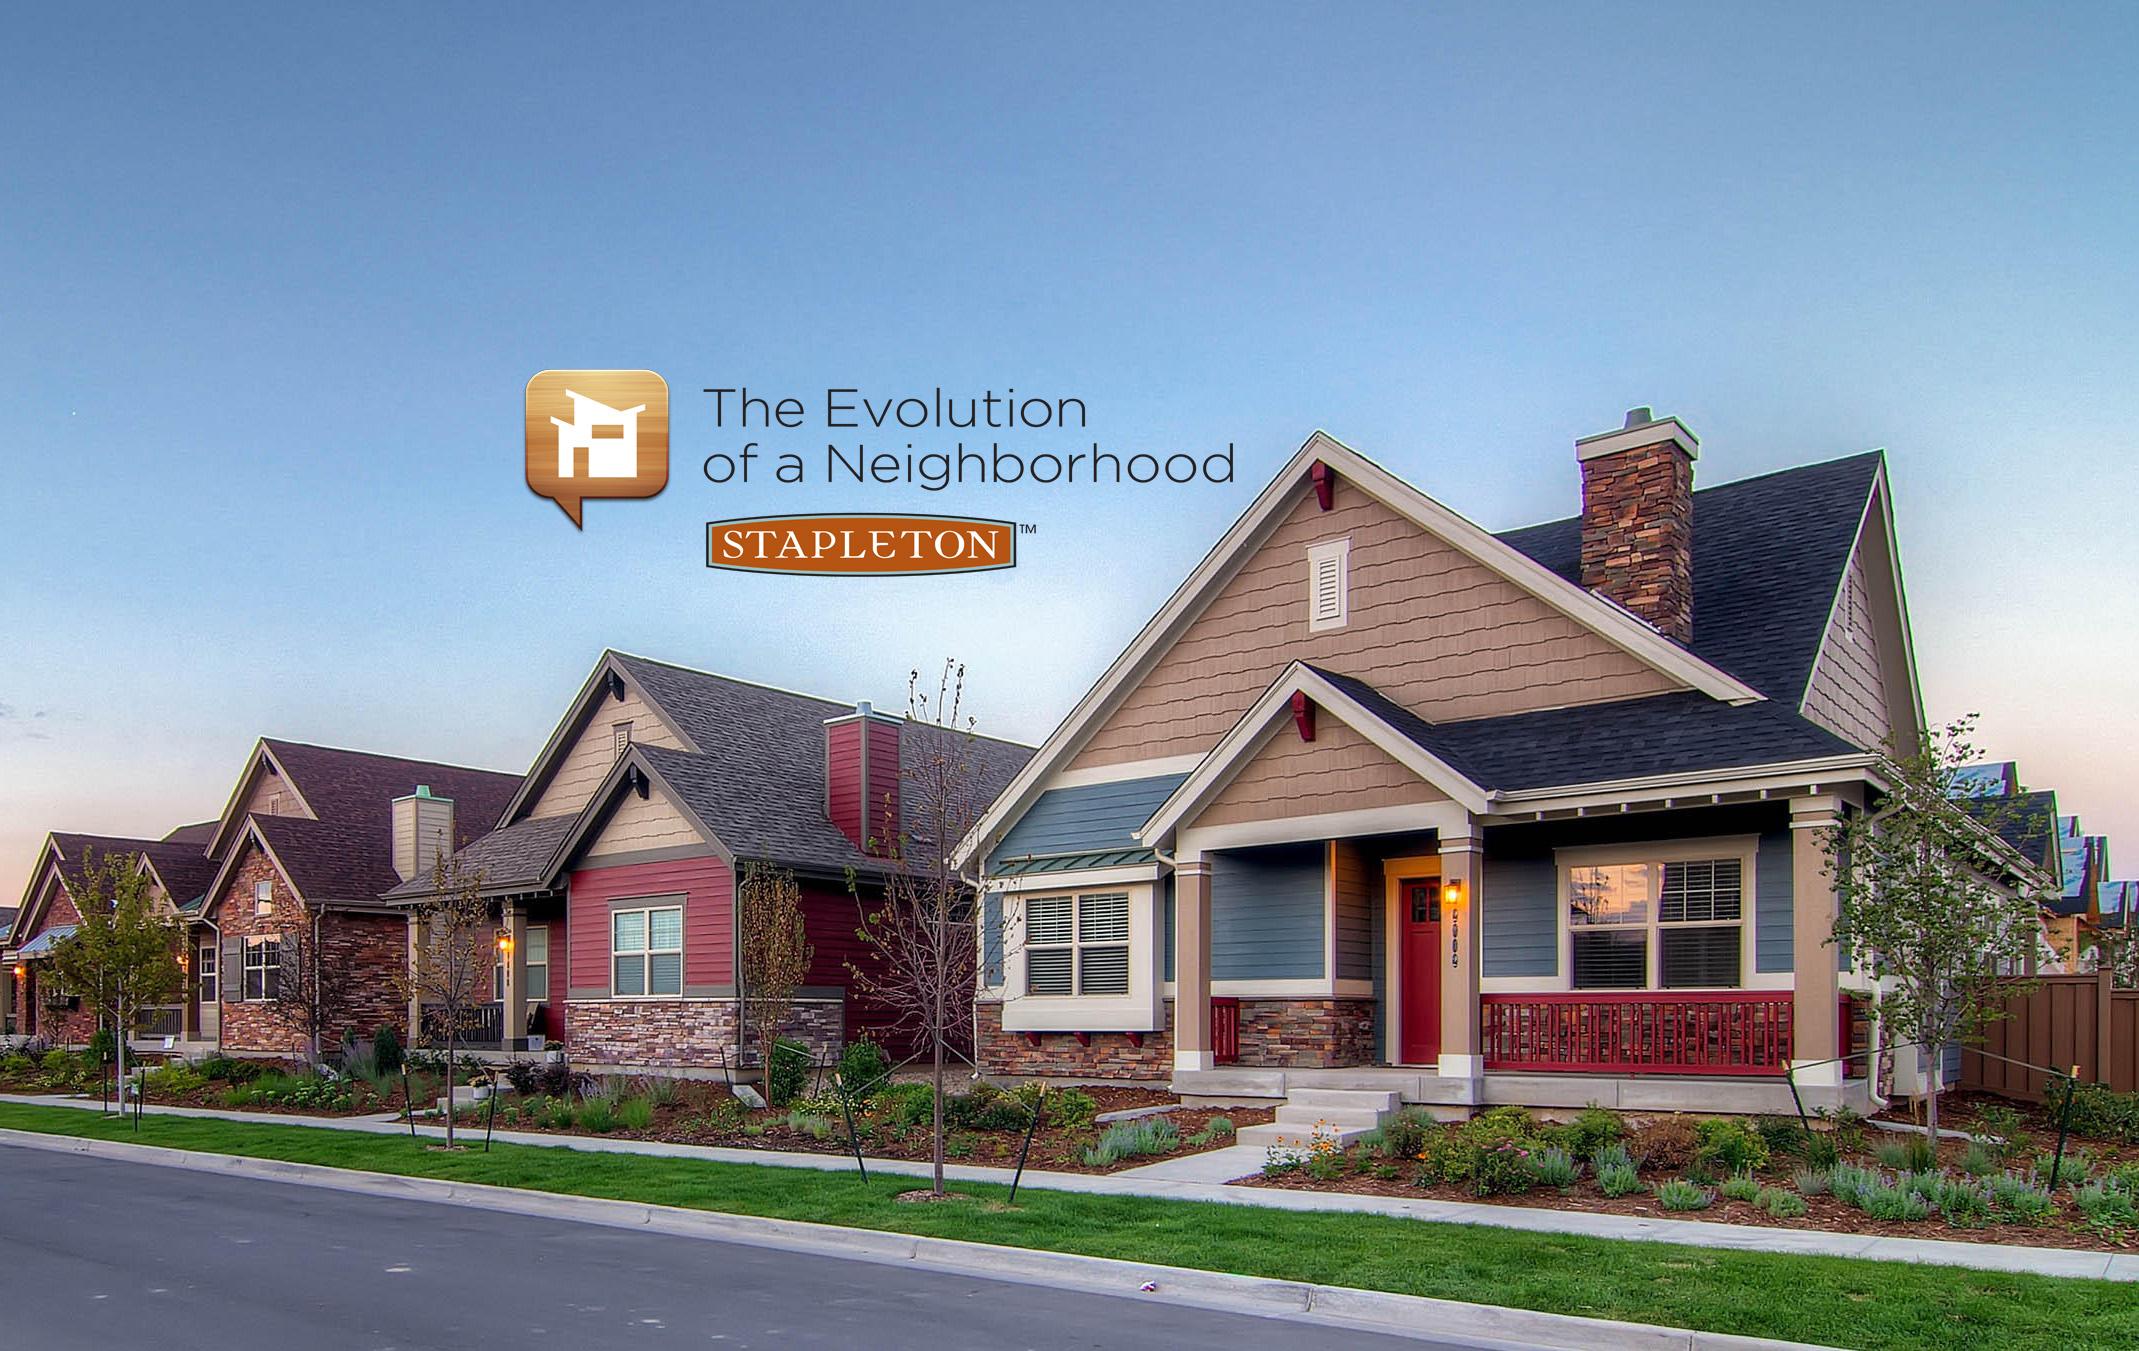 Evolution of a Neighborhood Boulder Creek Stapleton